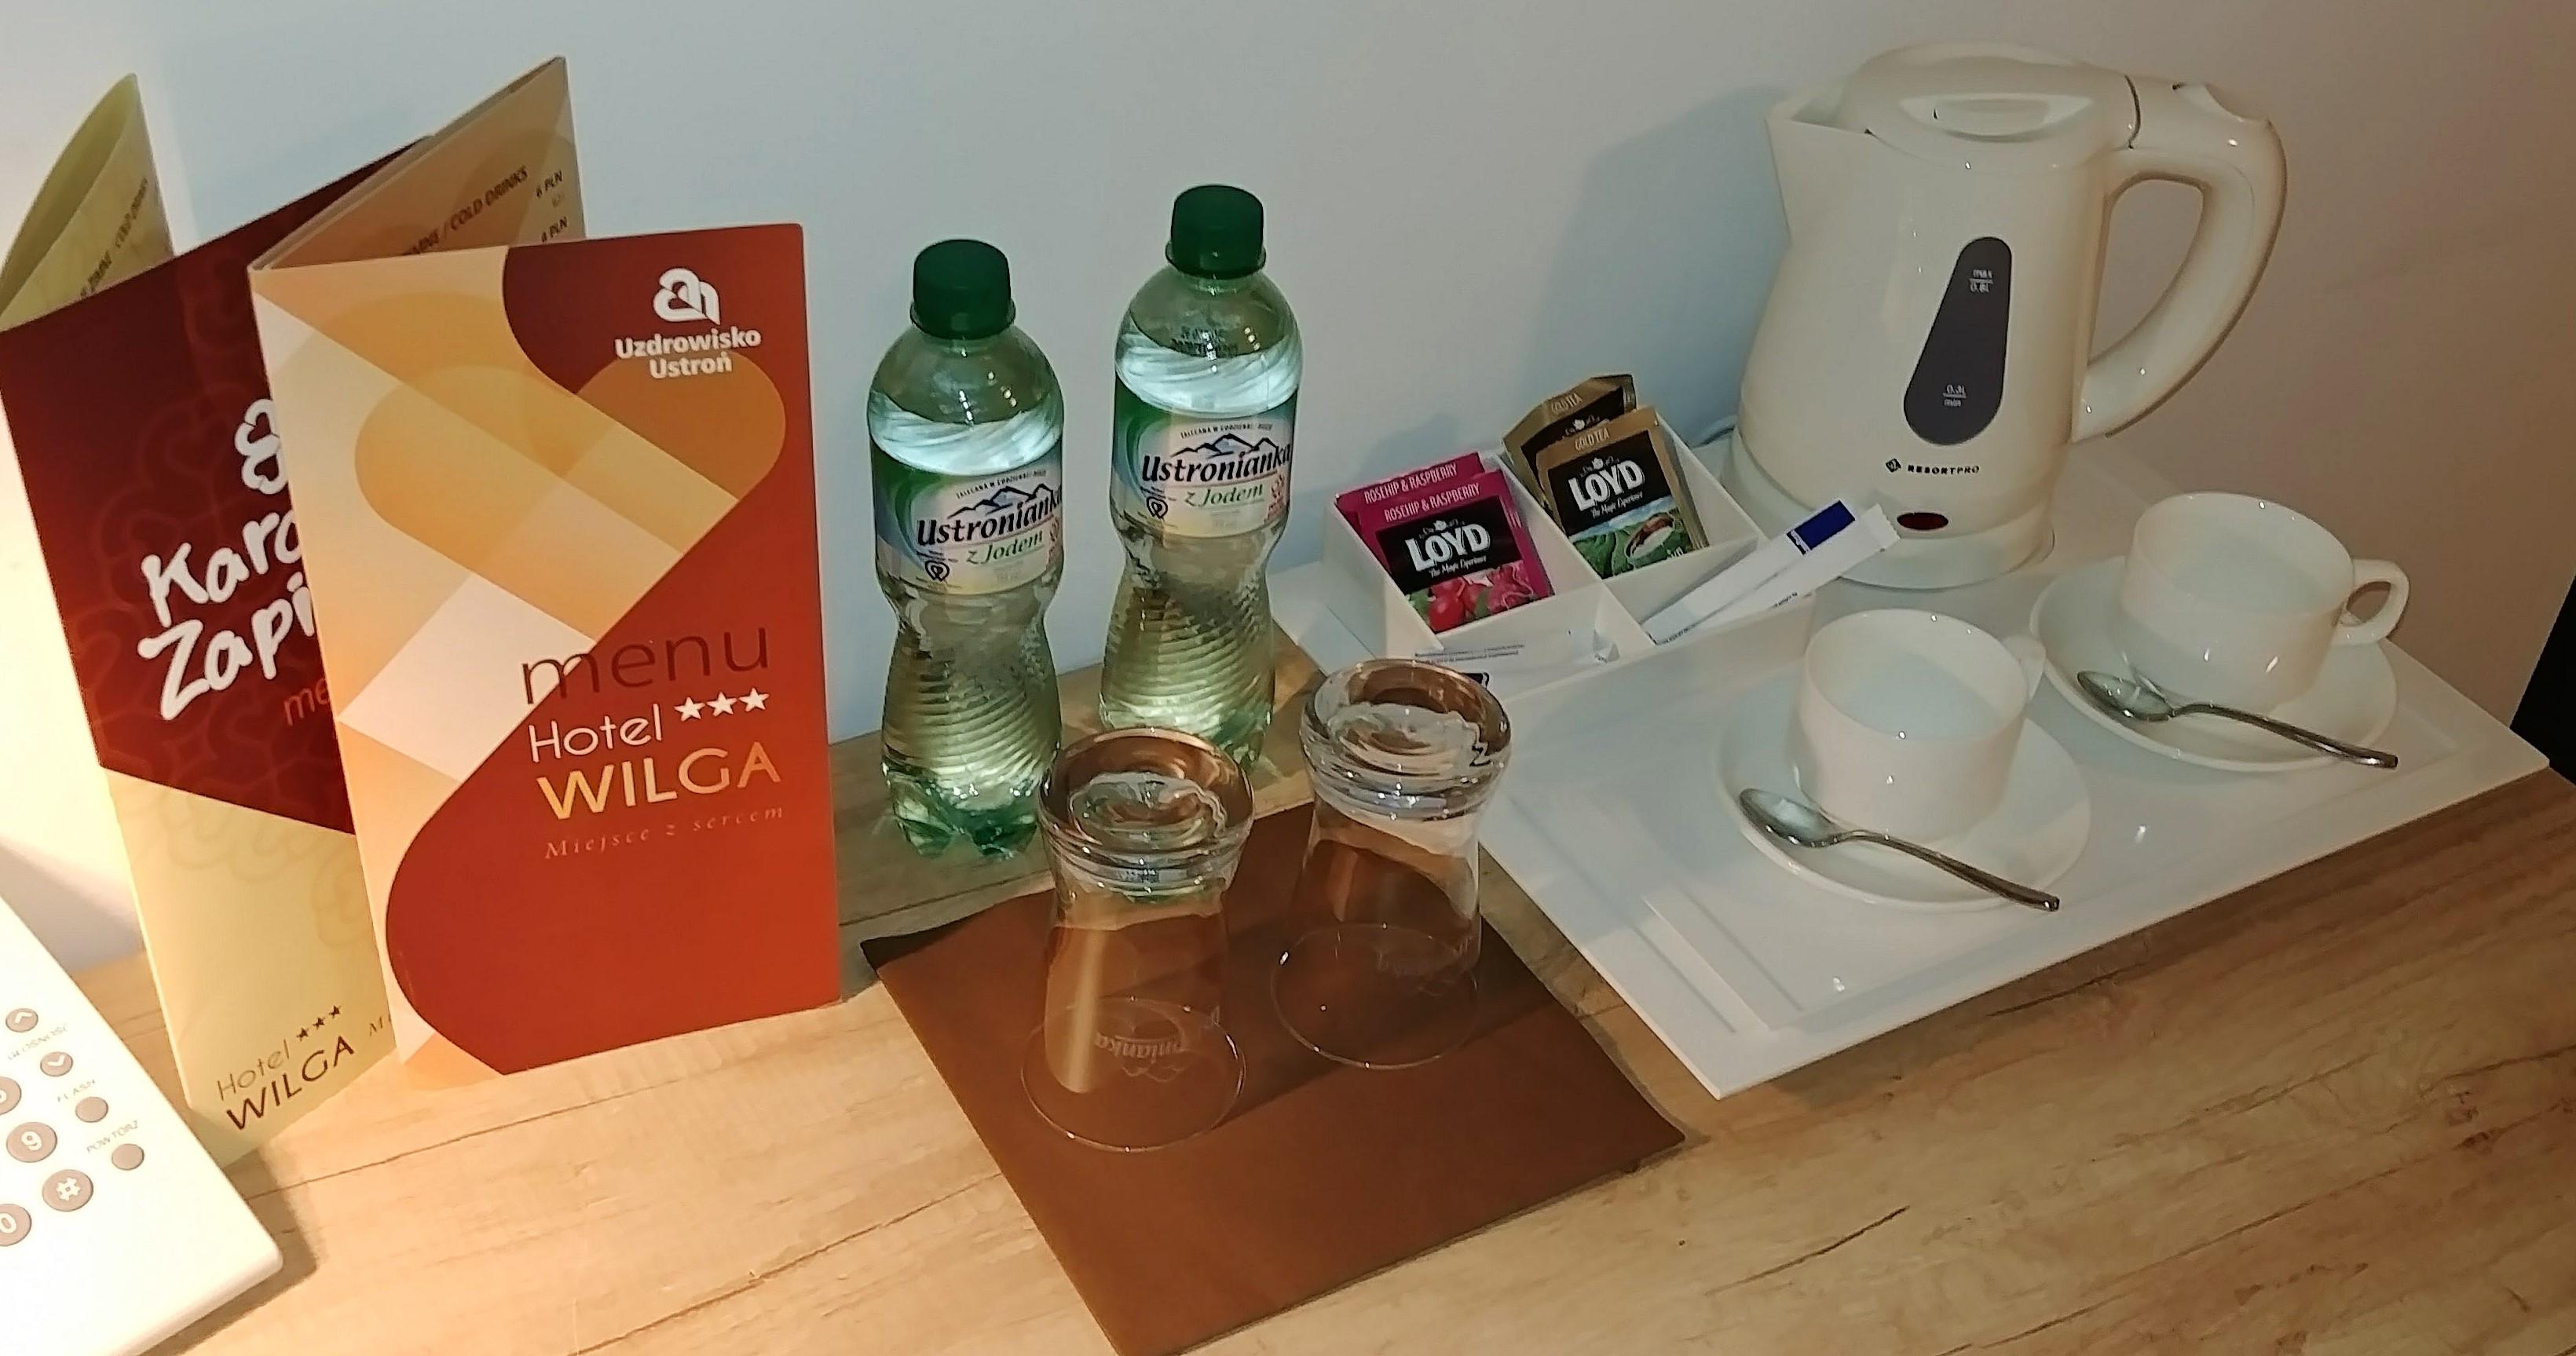 Czajnik i herbaty - Hotel Wilga